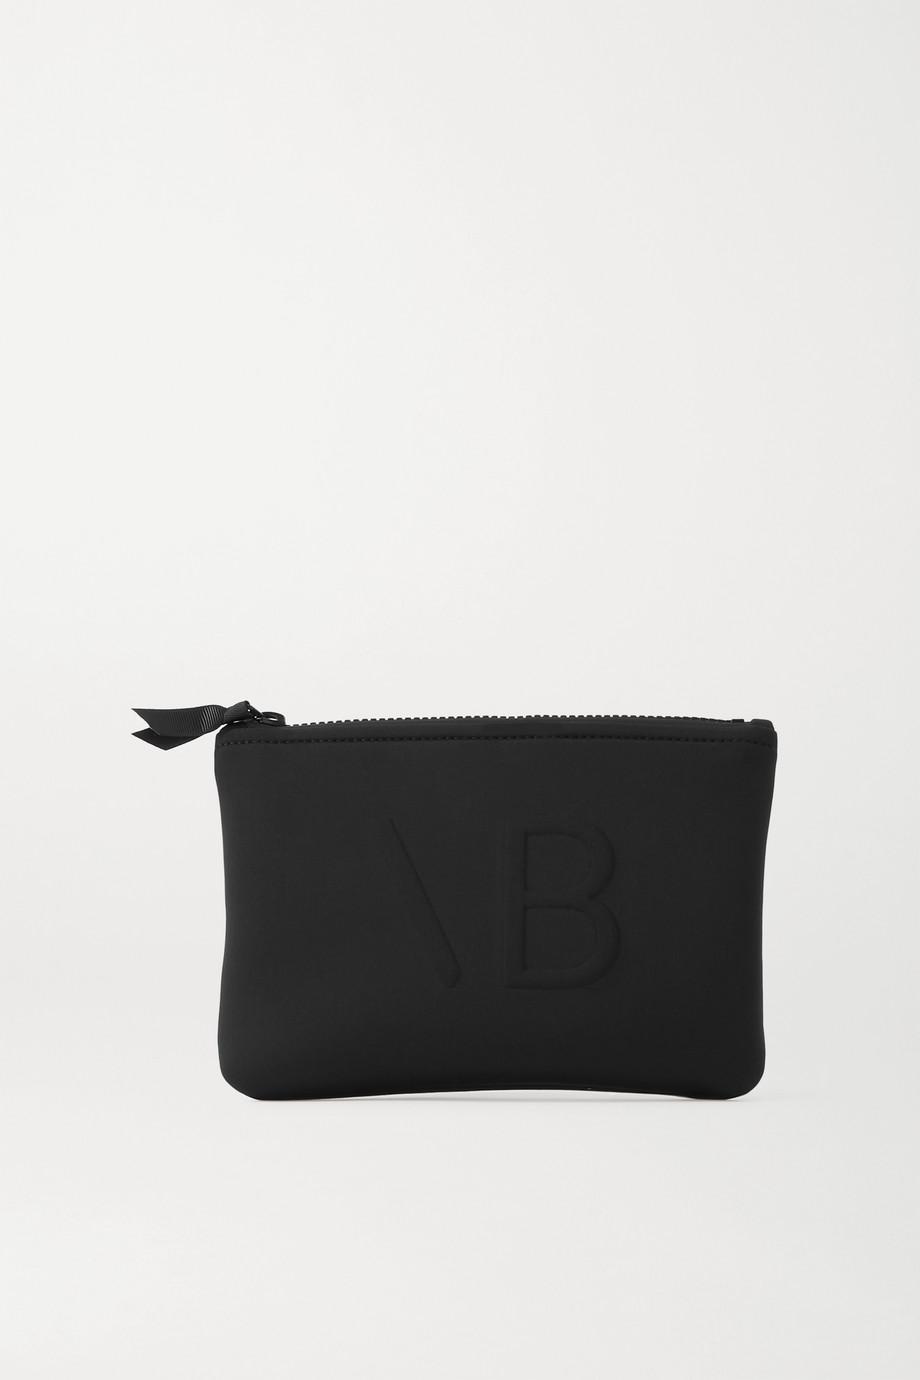 Victoria Beckham Beauty The VB Beauty Bag